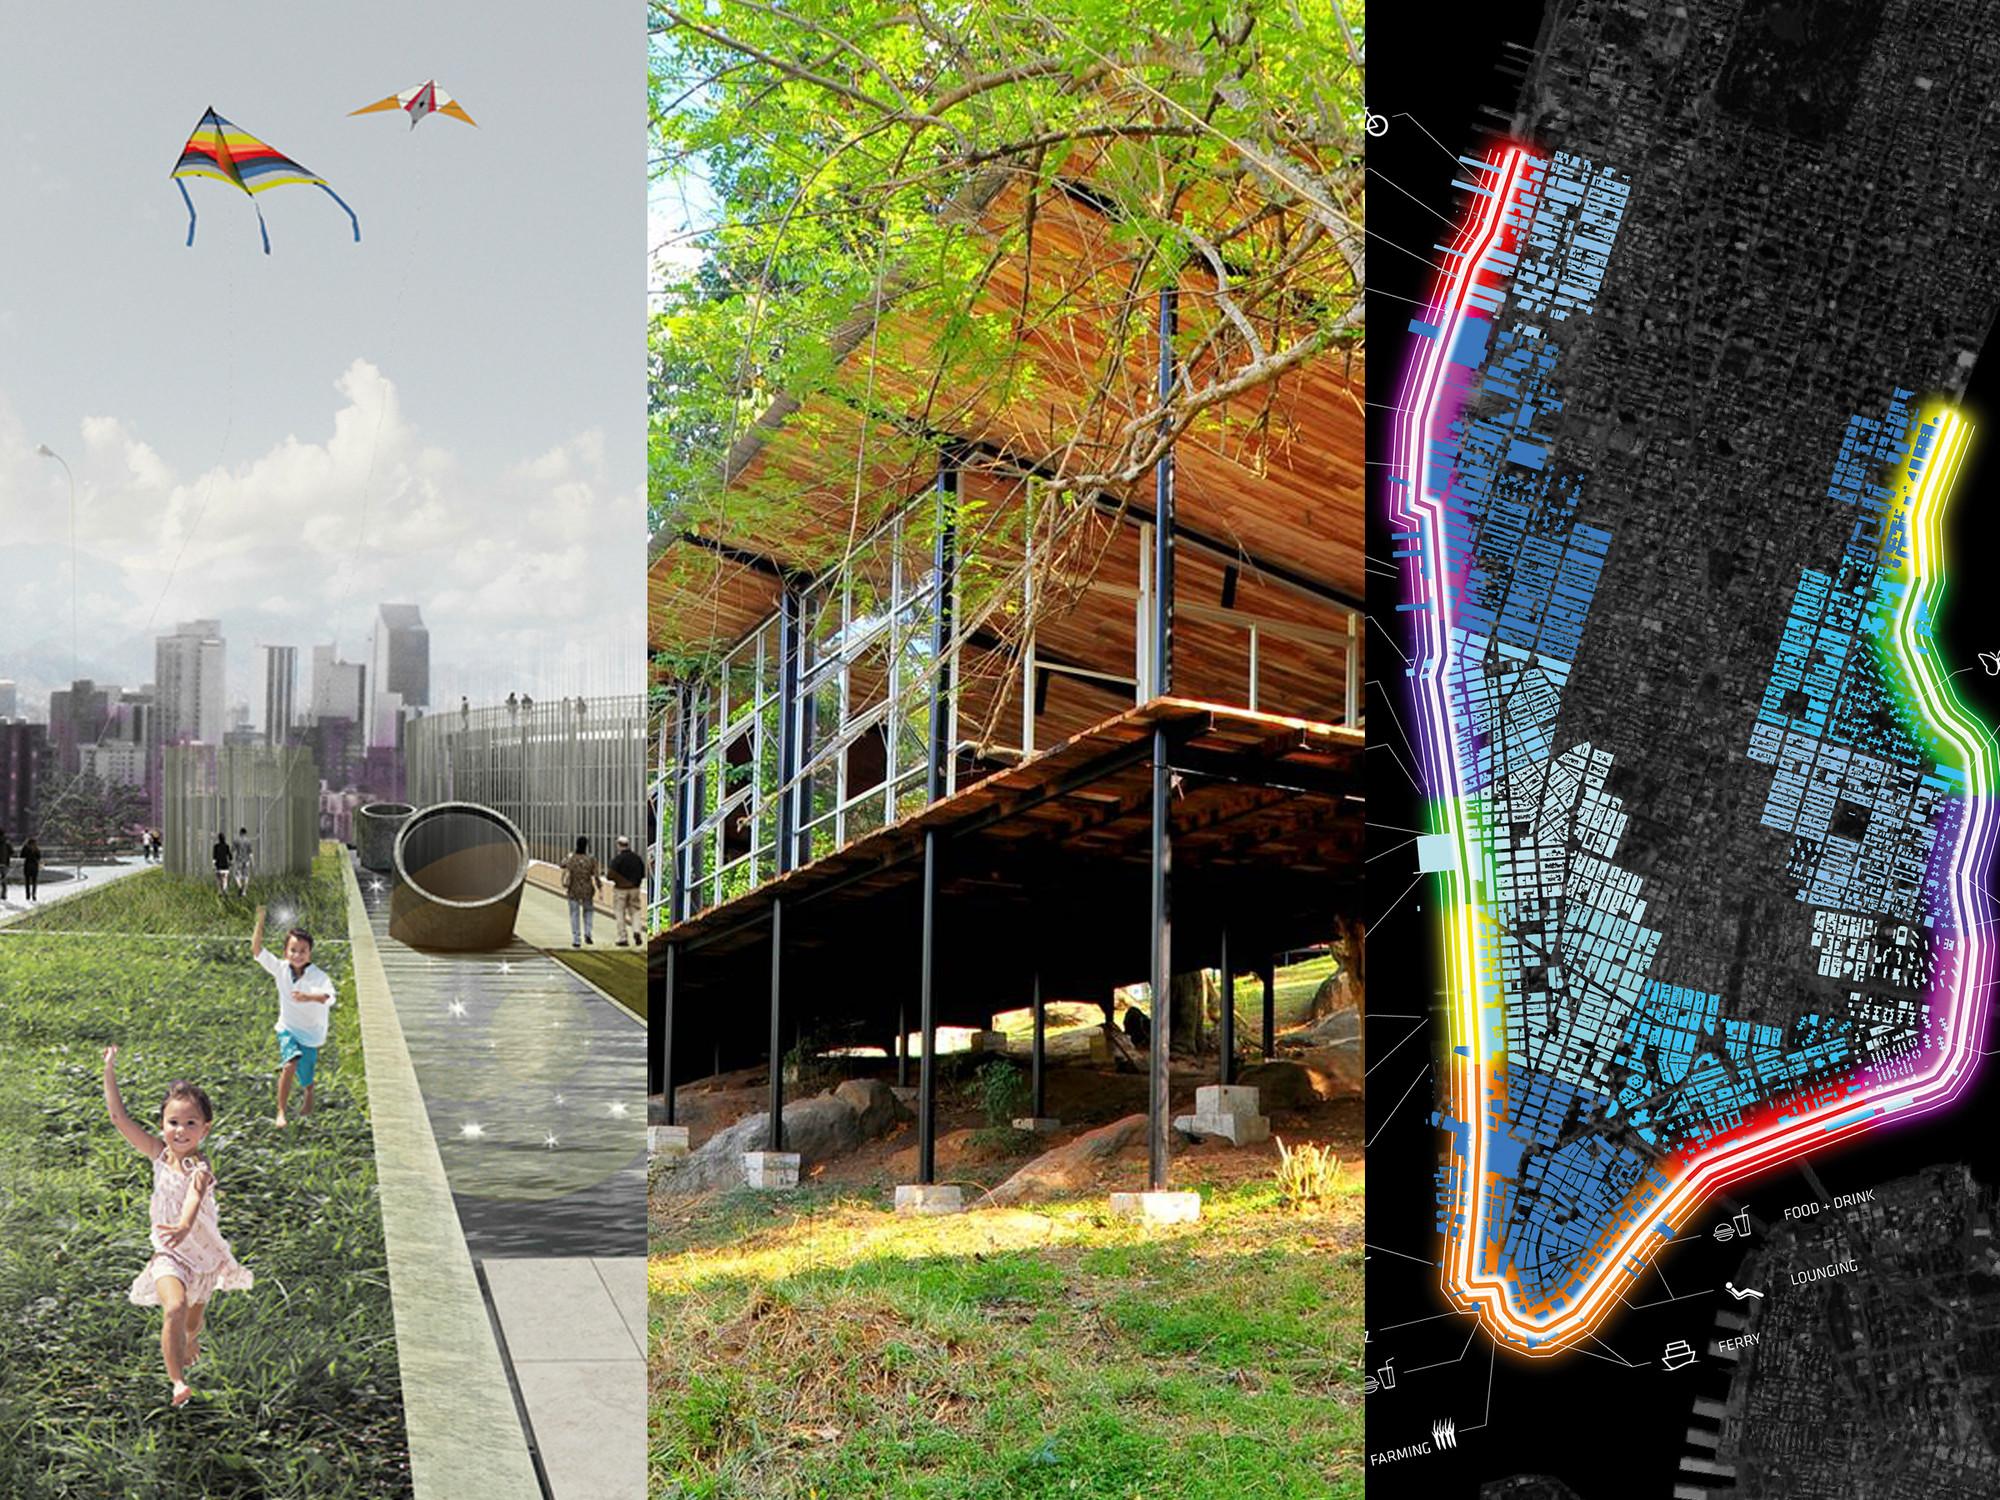 3 Projects Win 2015 Global Holcim Awards for Sustainability , Courtesy of Holcim Foundation